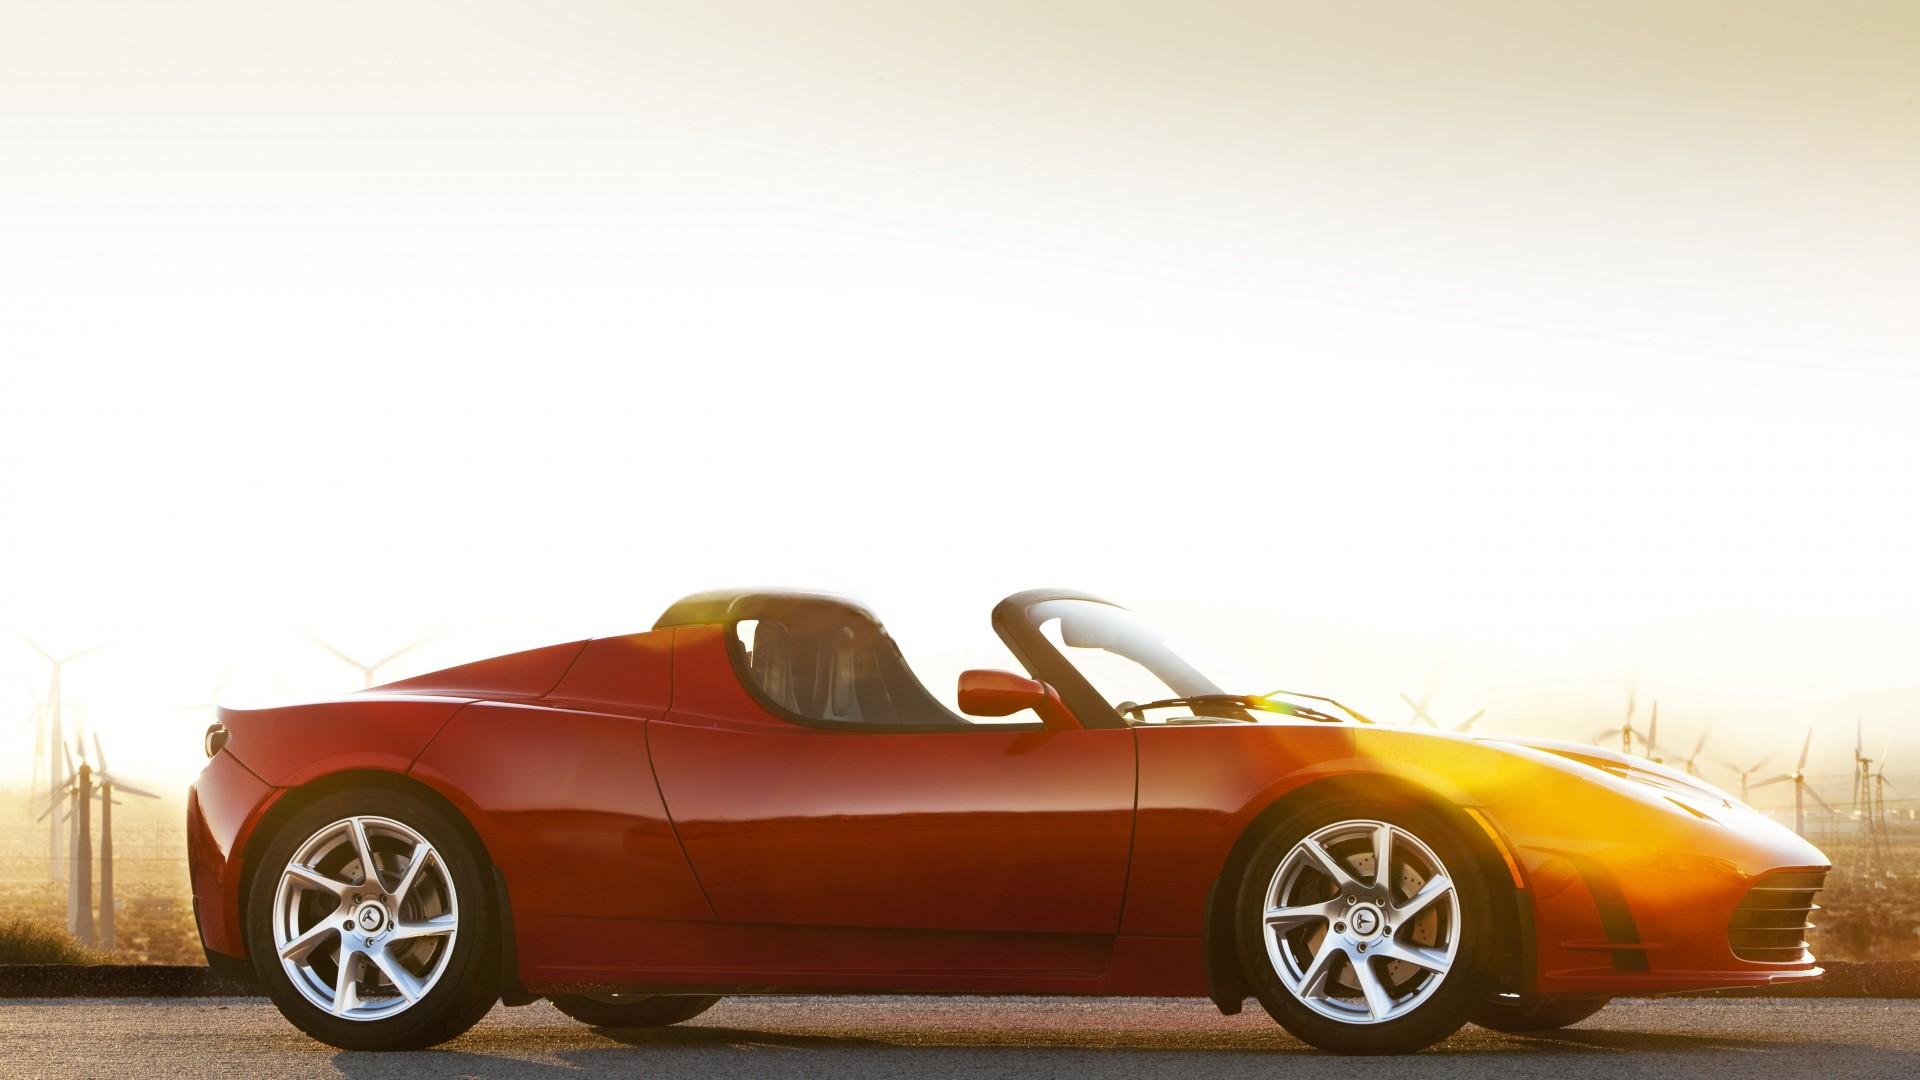 Uploaded by: patrice - Report ImageTesla Roadster Wallpaper, Cars & Bikes / Brand: Tesla Roadster, electric cars, Tesla Motors, sports car, red, side, speed, review, test drive - 웹